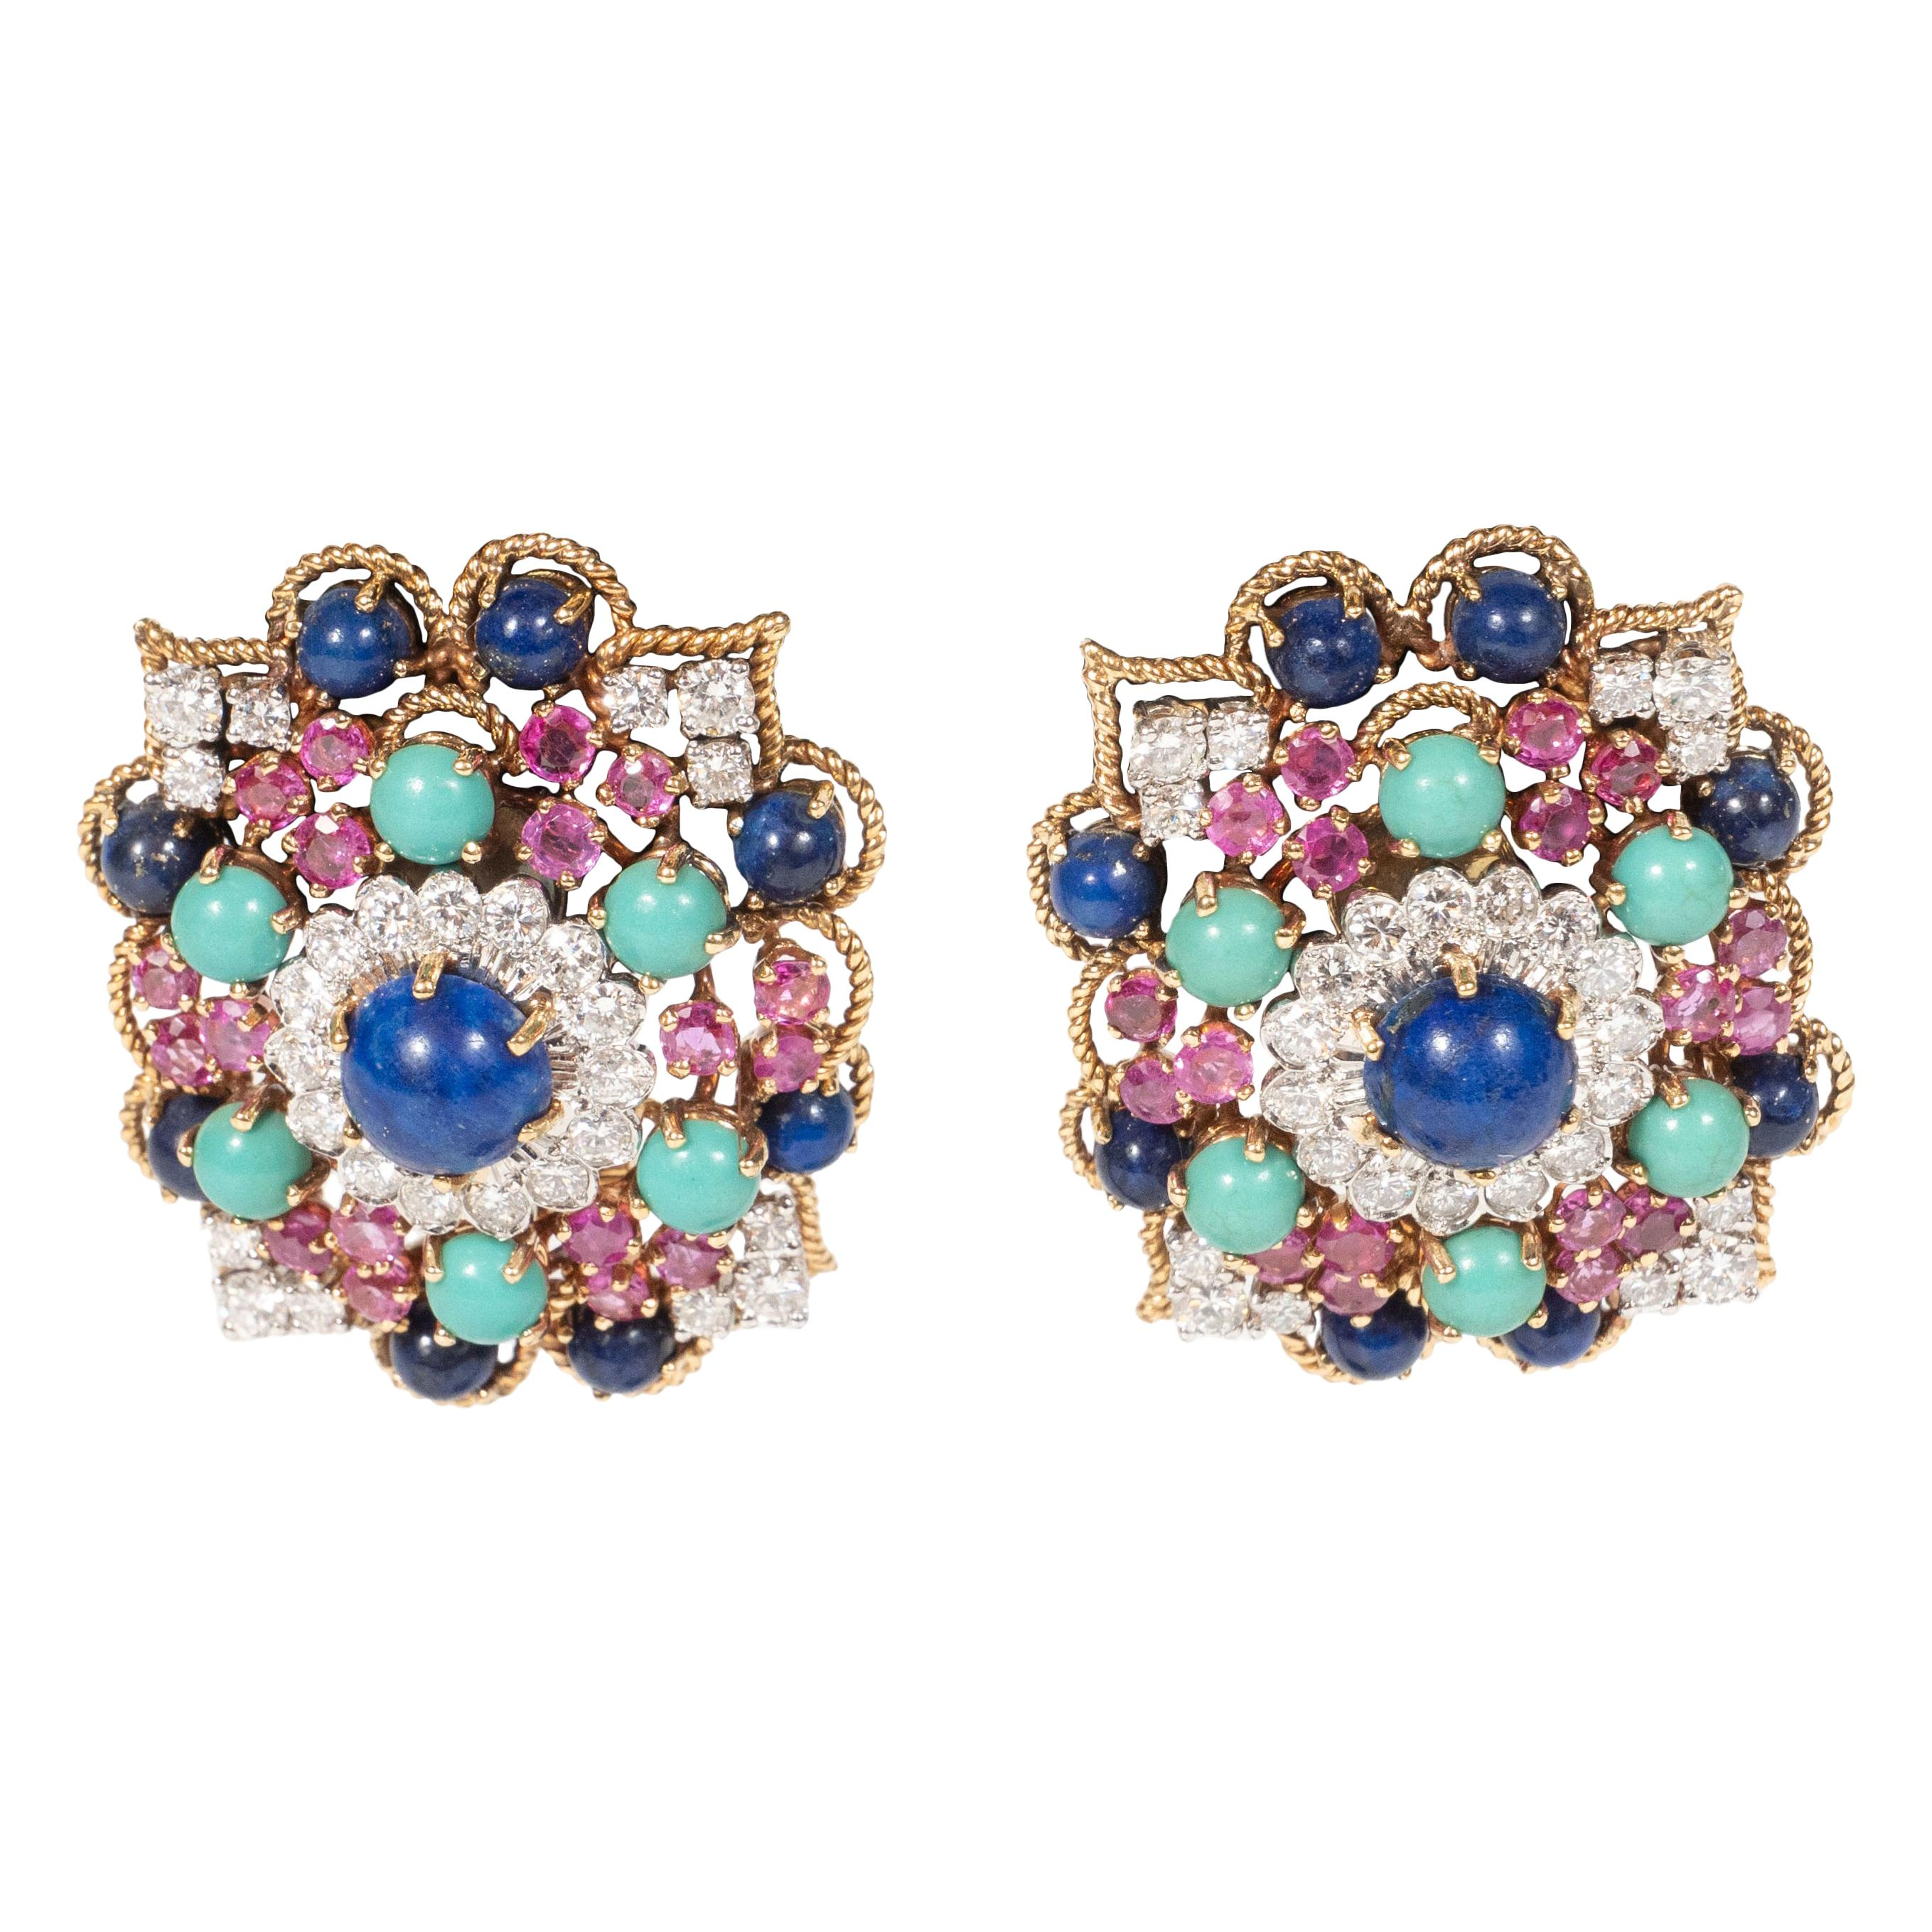 Midcentury Marianne Ostier Colored Stone Diamond Gold Platinum Earrings